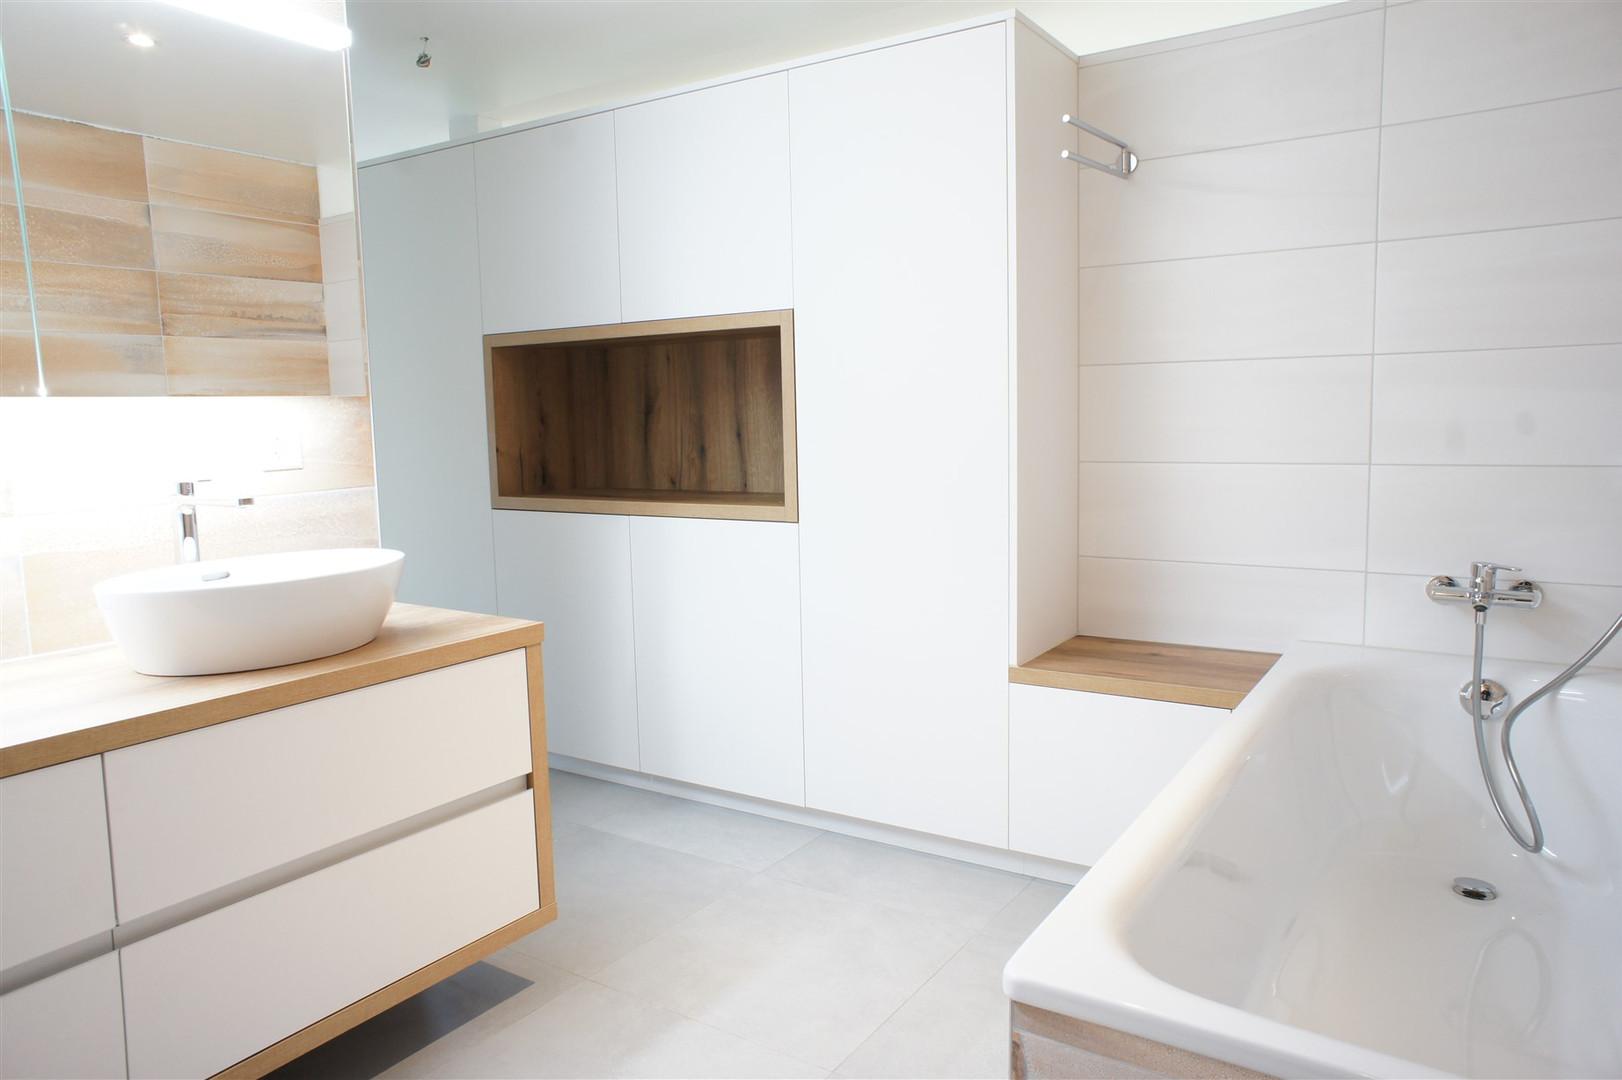 Salle_de_bain-blanche.jpg